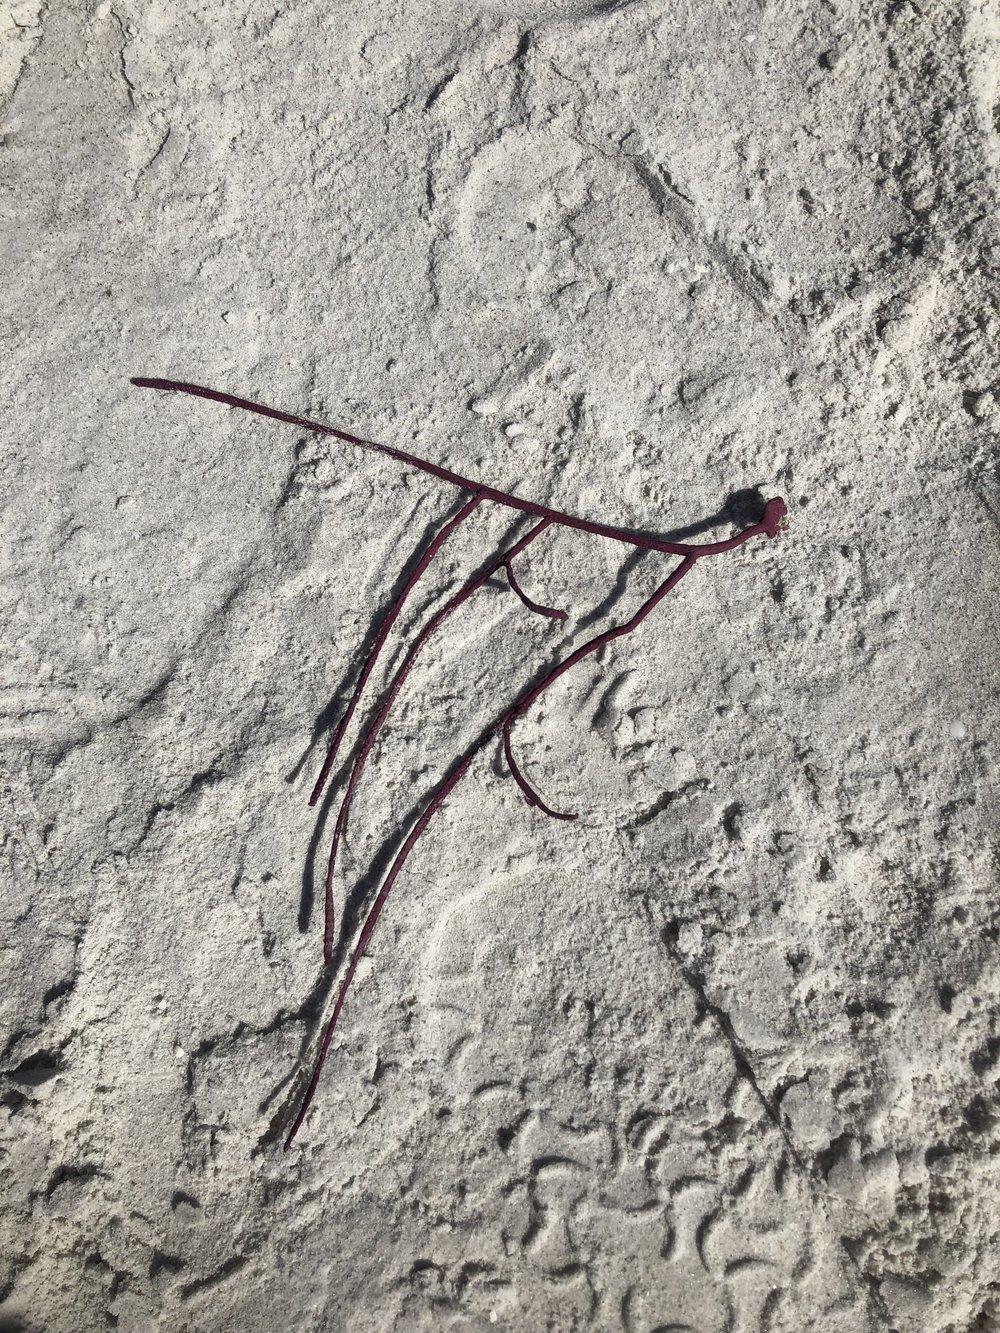 A gorgonian on Sanibel.